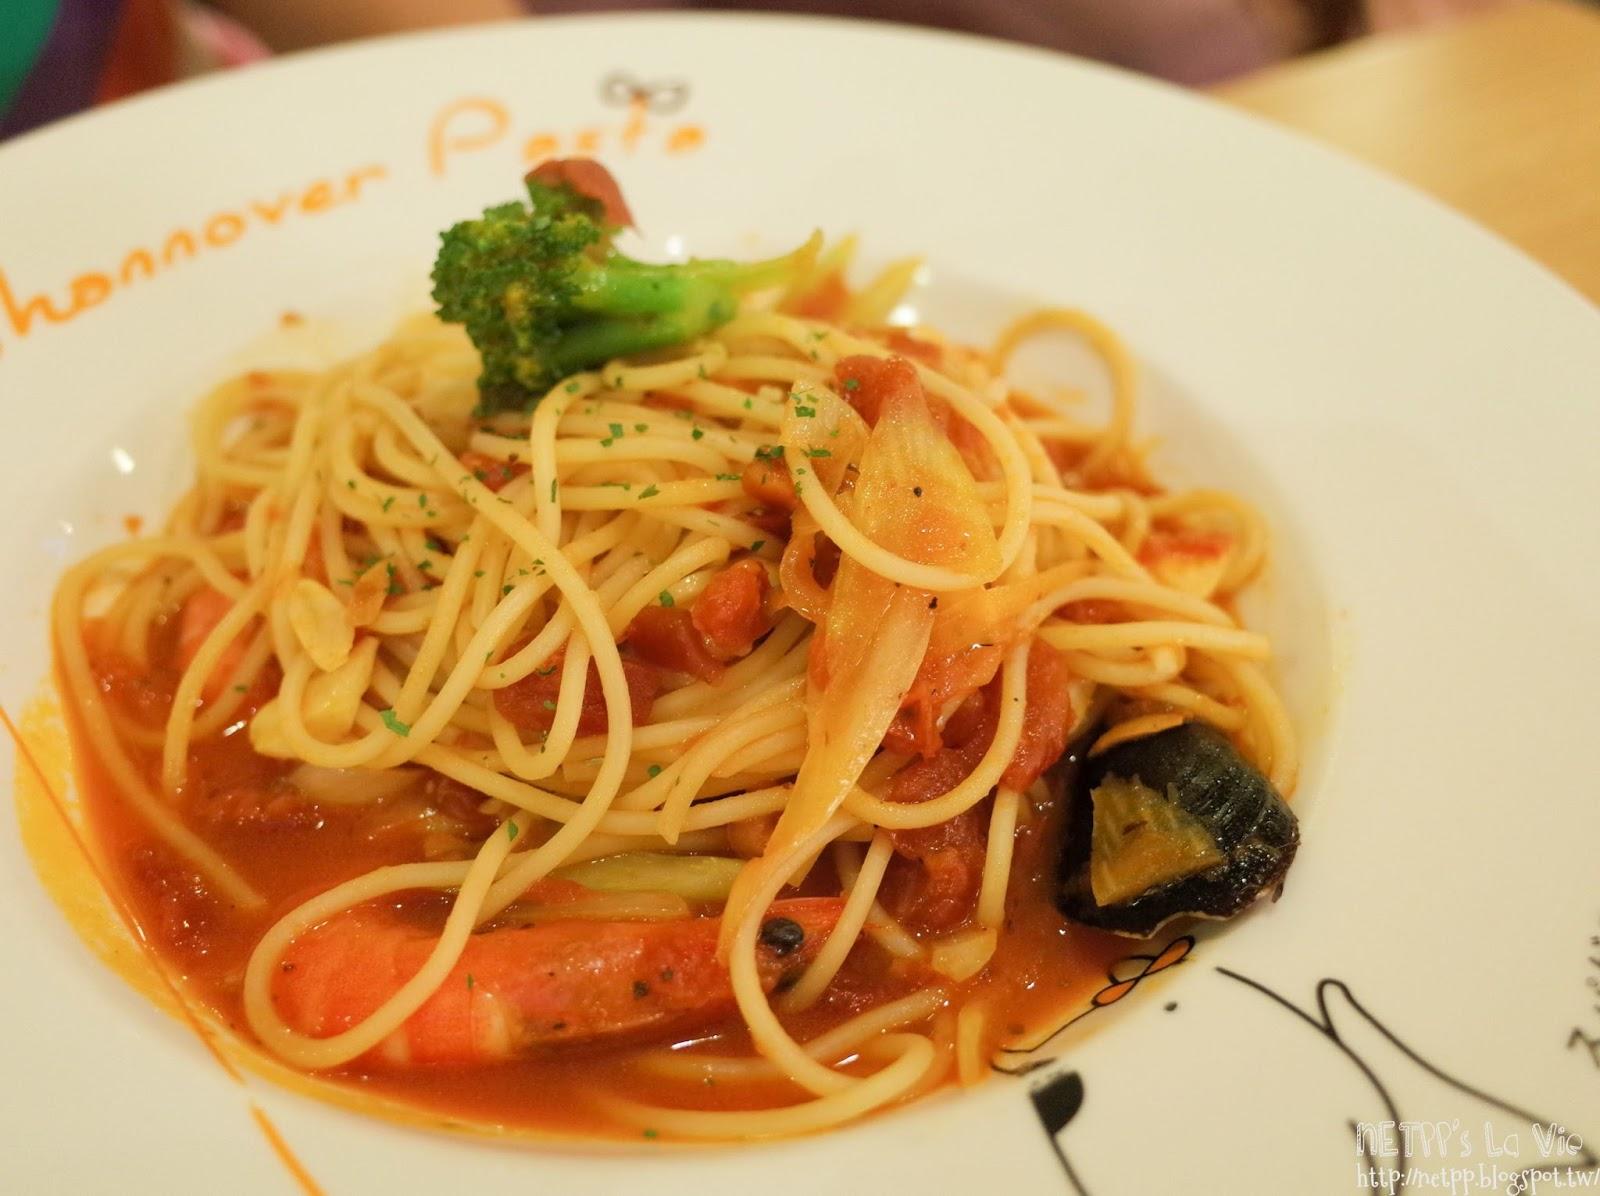 NETPP's La Vie: 【中壢】Shannover pasta。夏諾瓦義大利麵